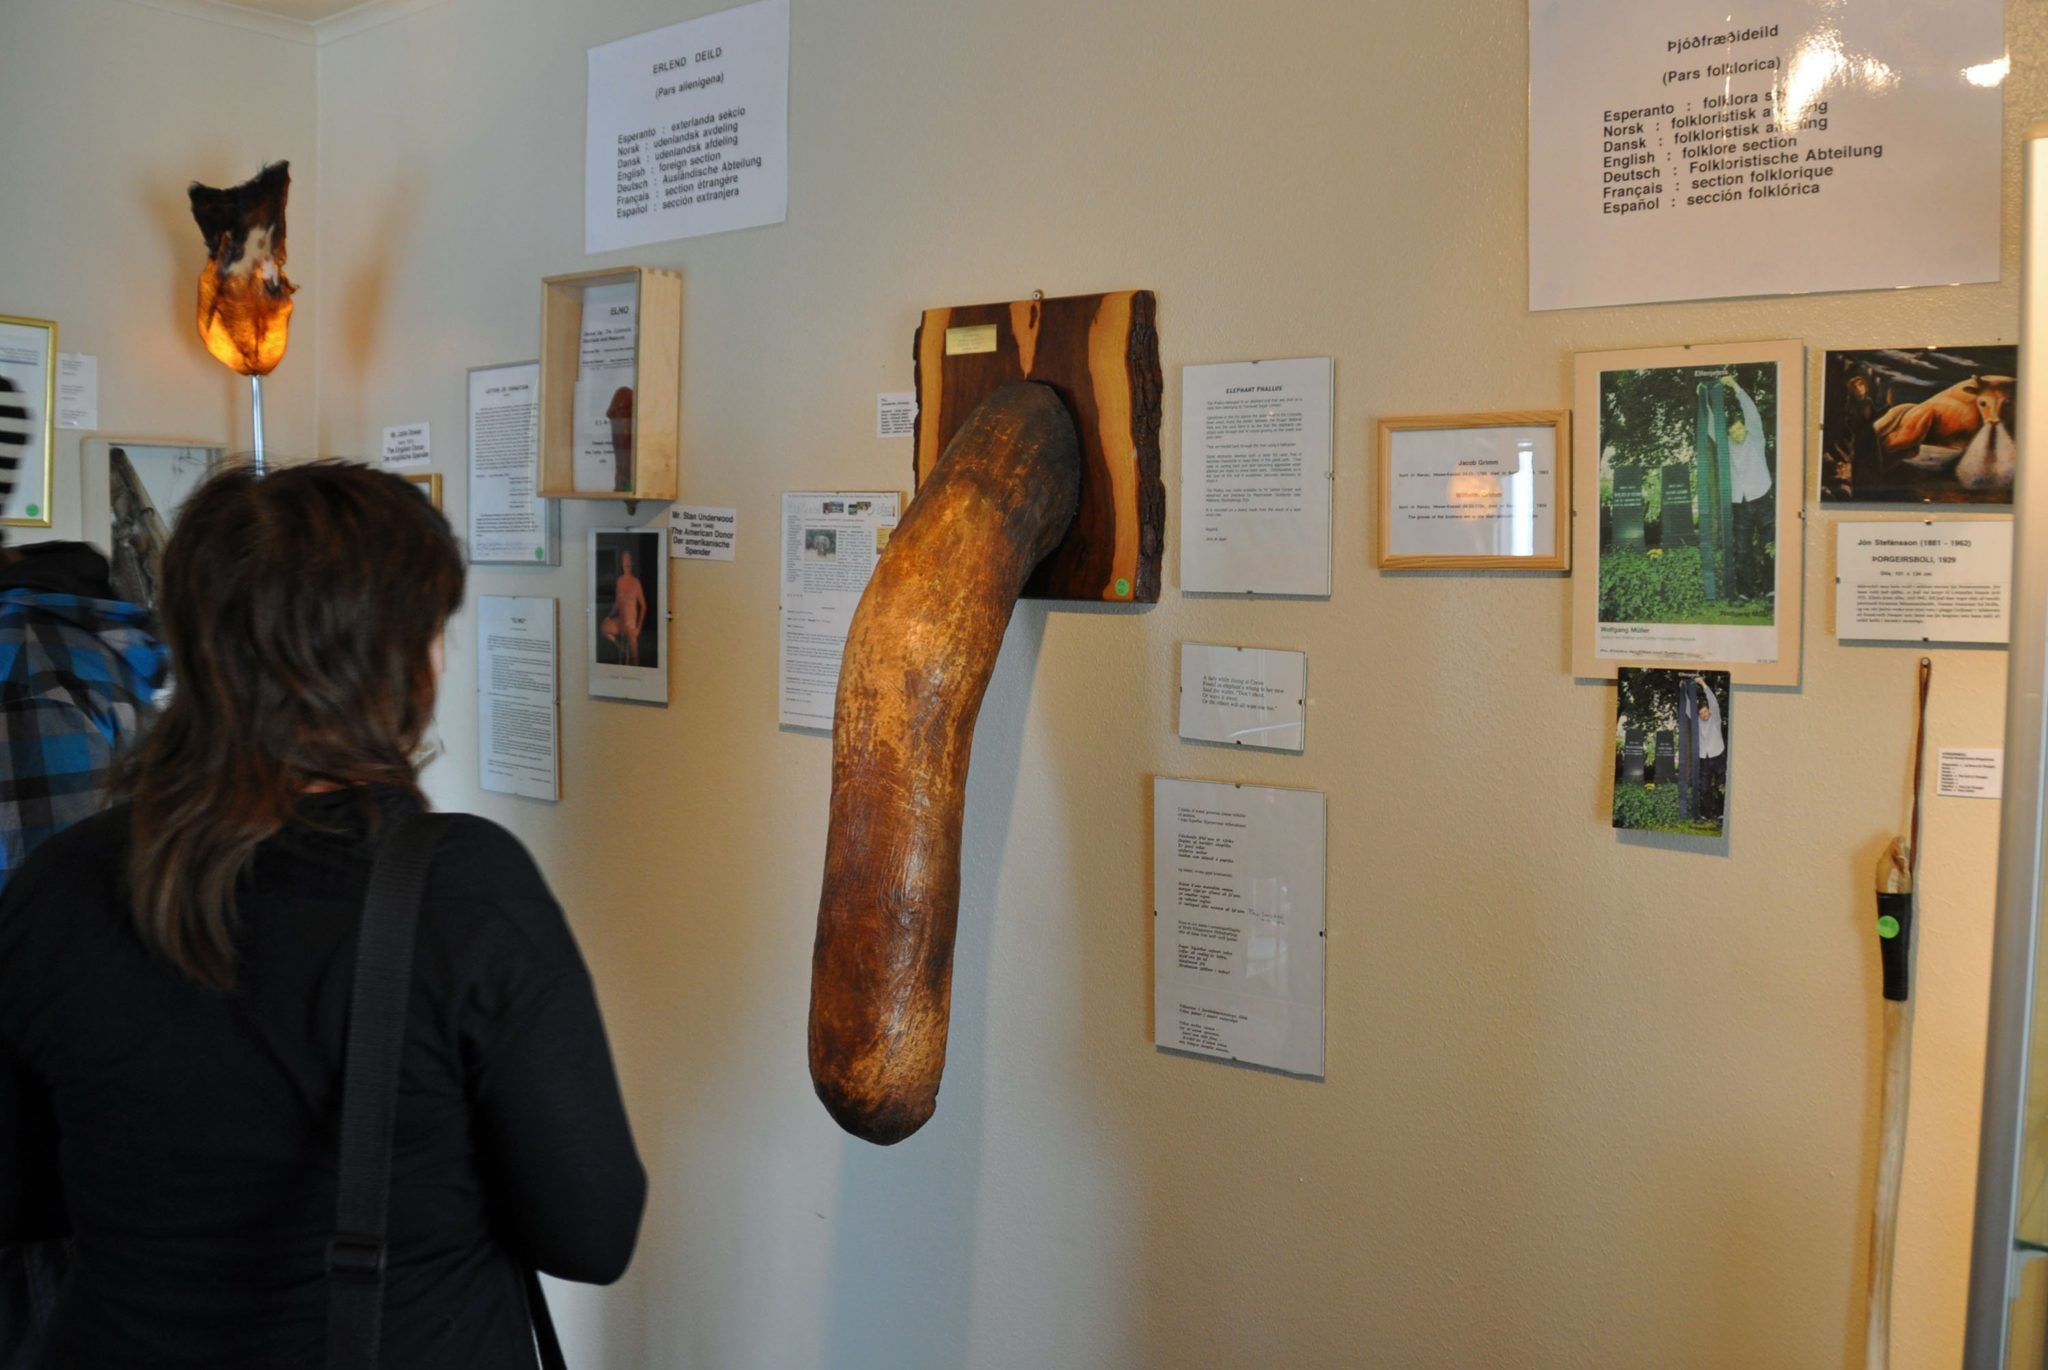 THE PENIS MUSEUM IN REYKJAVIK